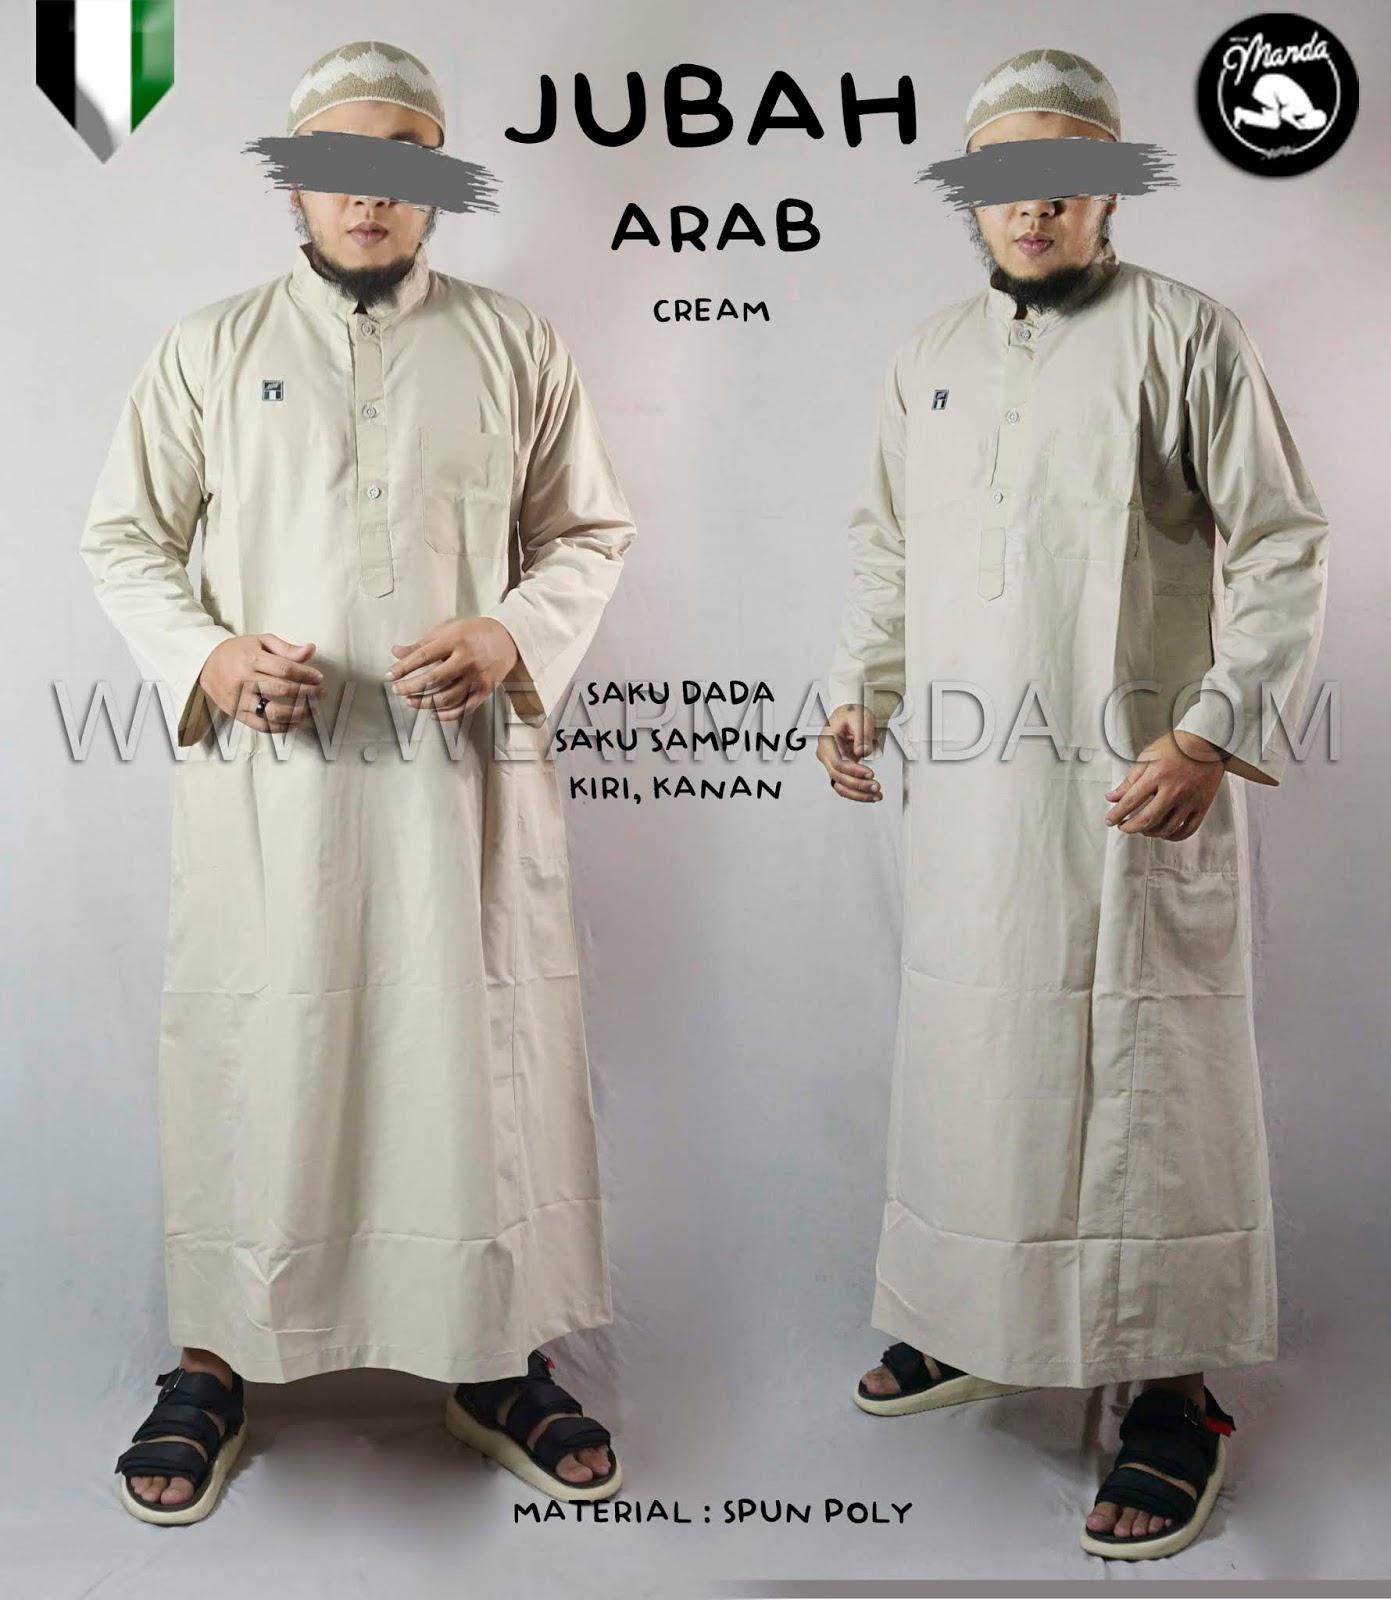 JUBAH ARAB CREAM